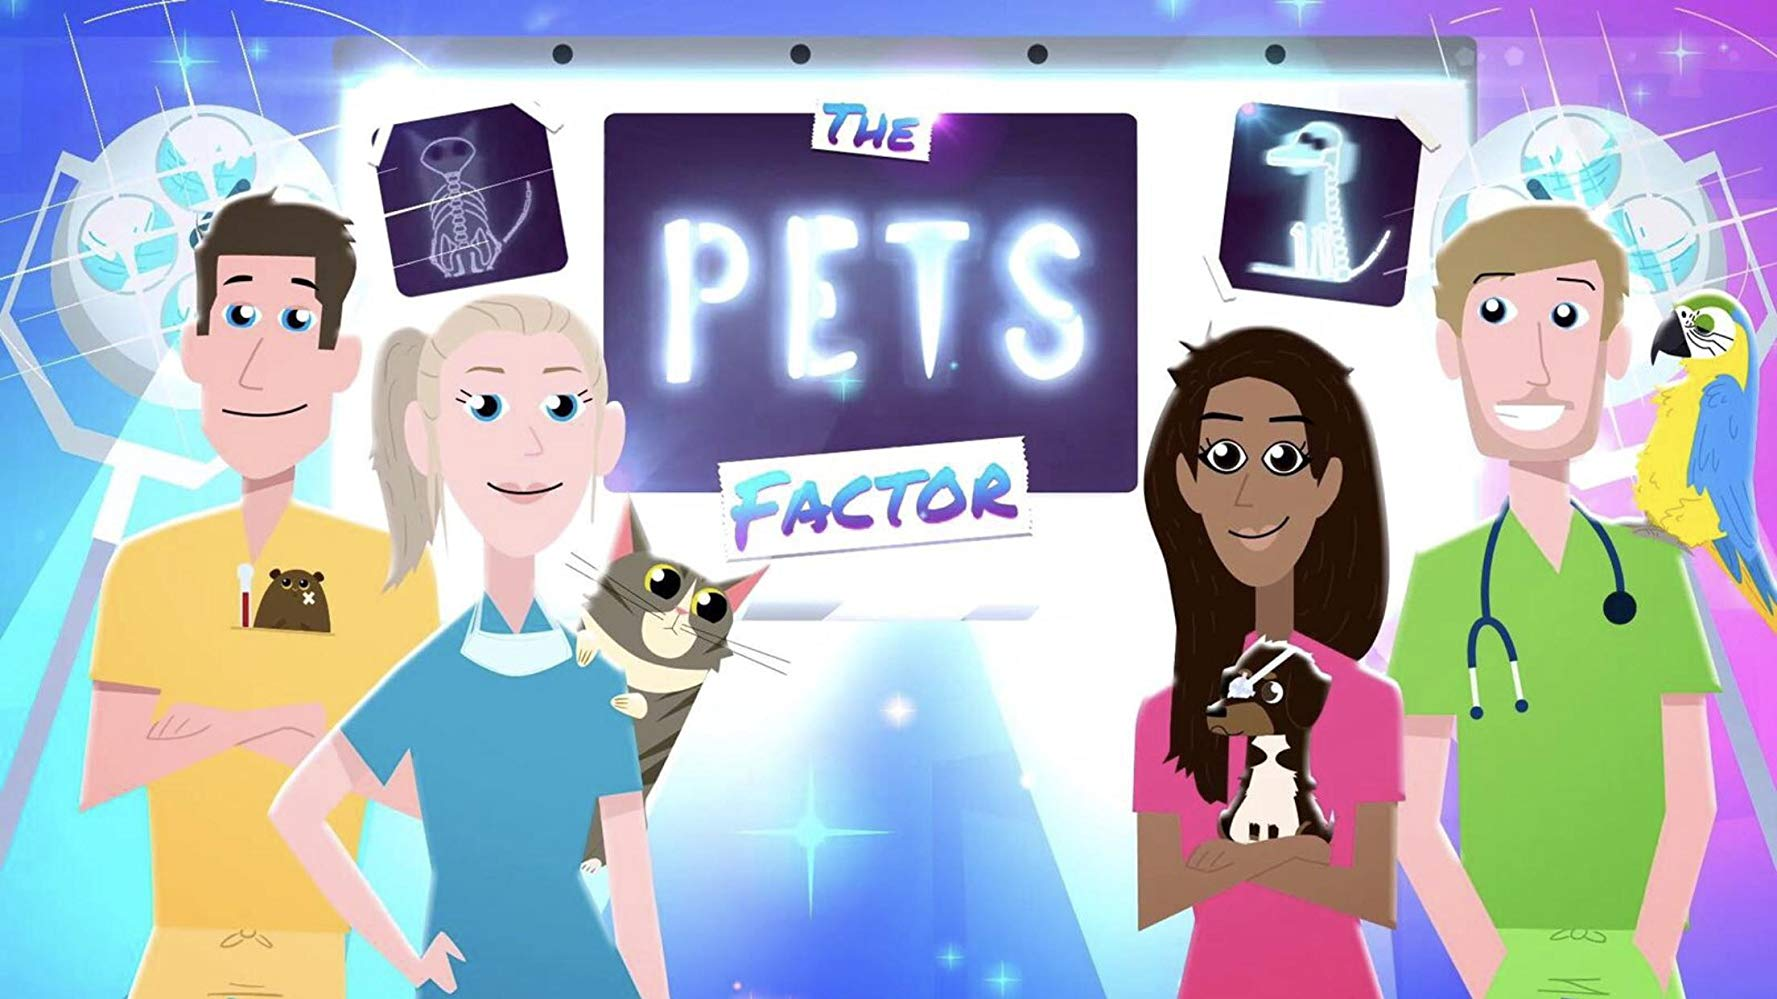 The Pets Factor S04E11 INTERNAL 720p WEB h264-WEBTUBE